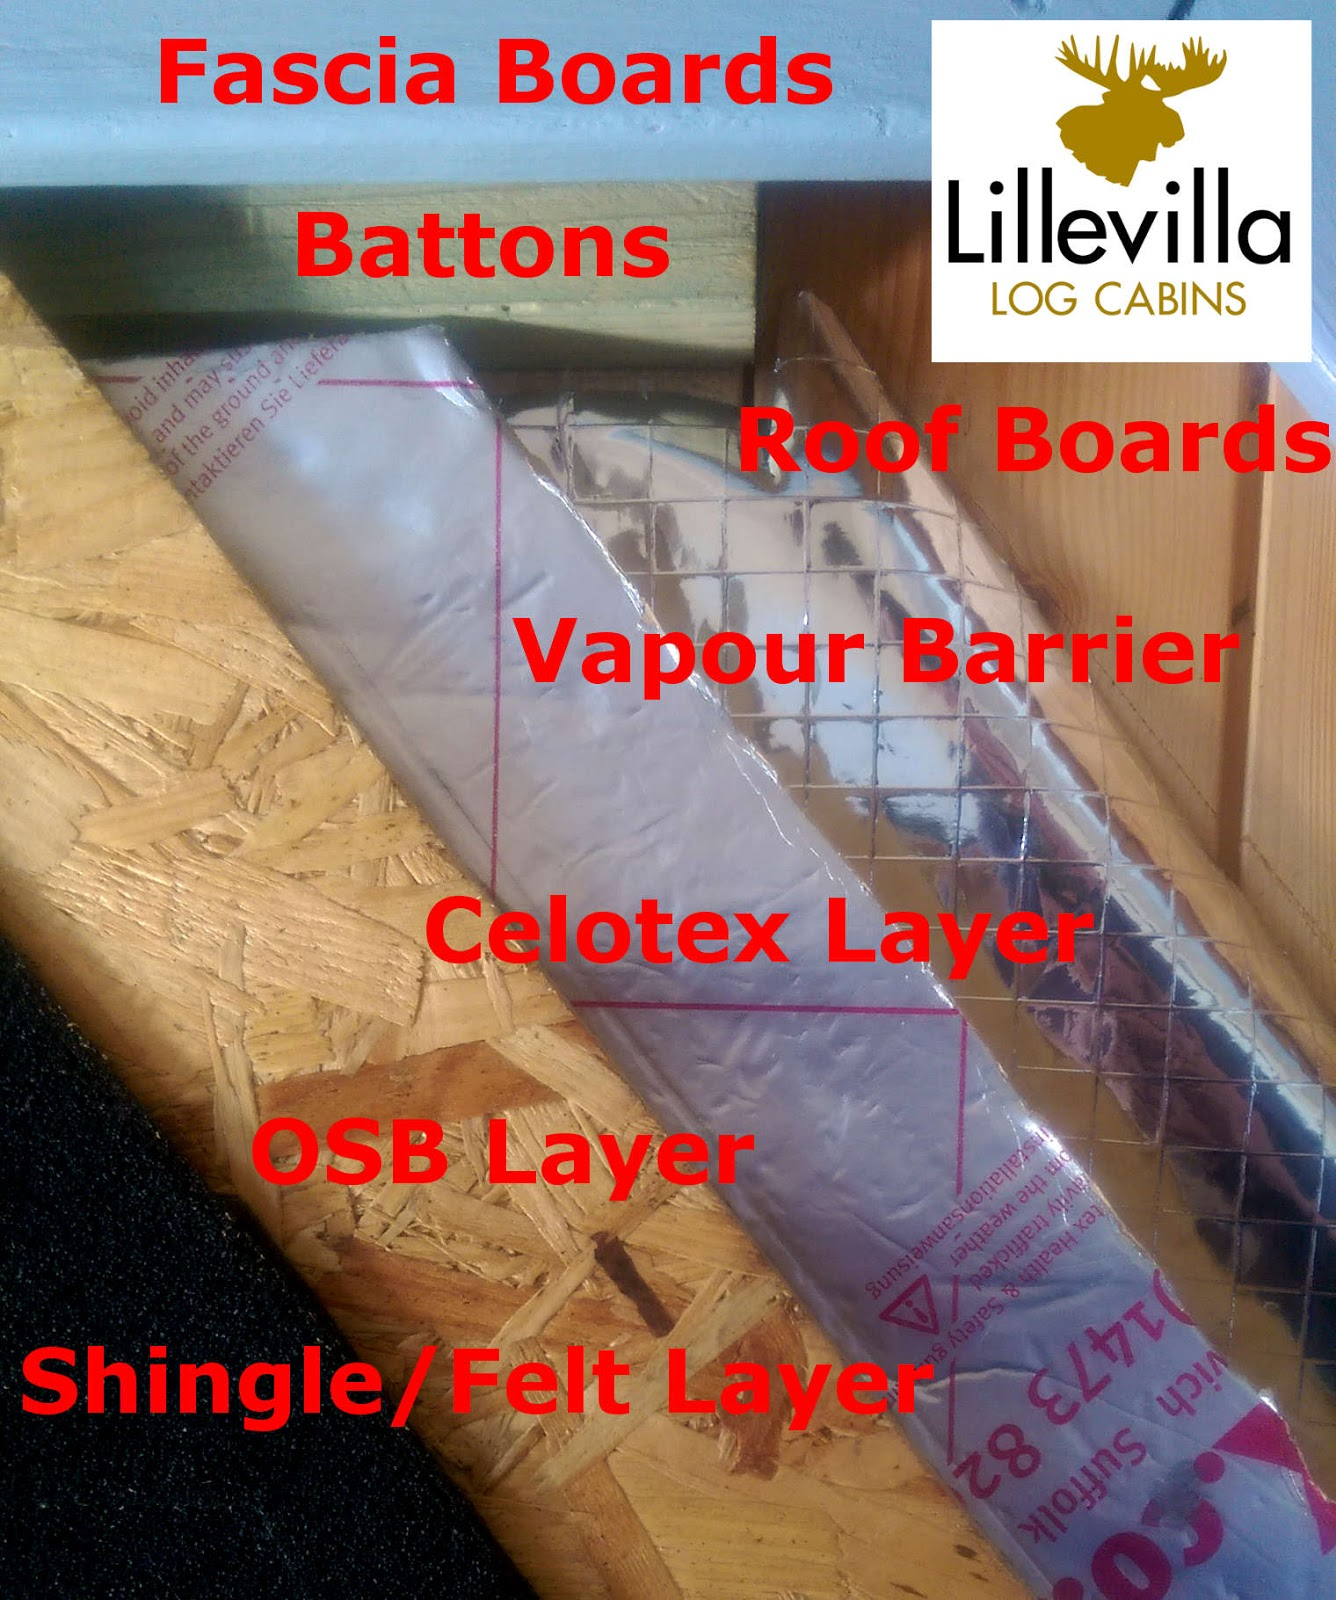 Lillevilla Log Cabin Insulation Guide Lillevilla Log Cabins